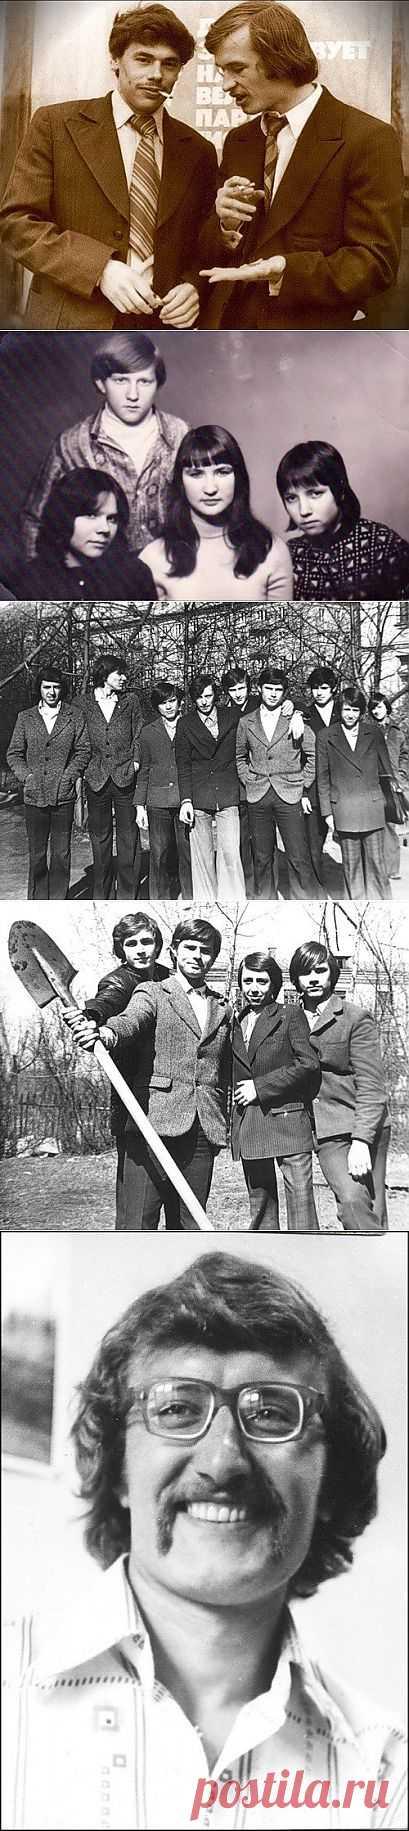 Прически 70-х / Обратно в СССР